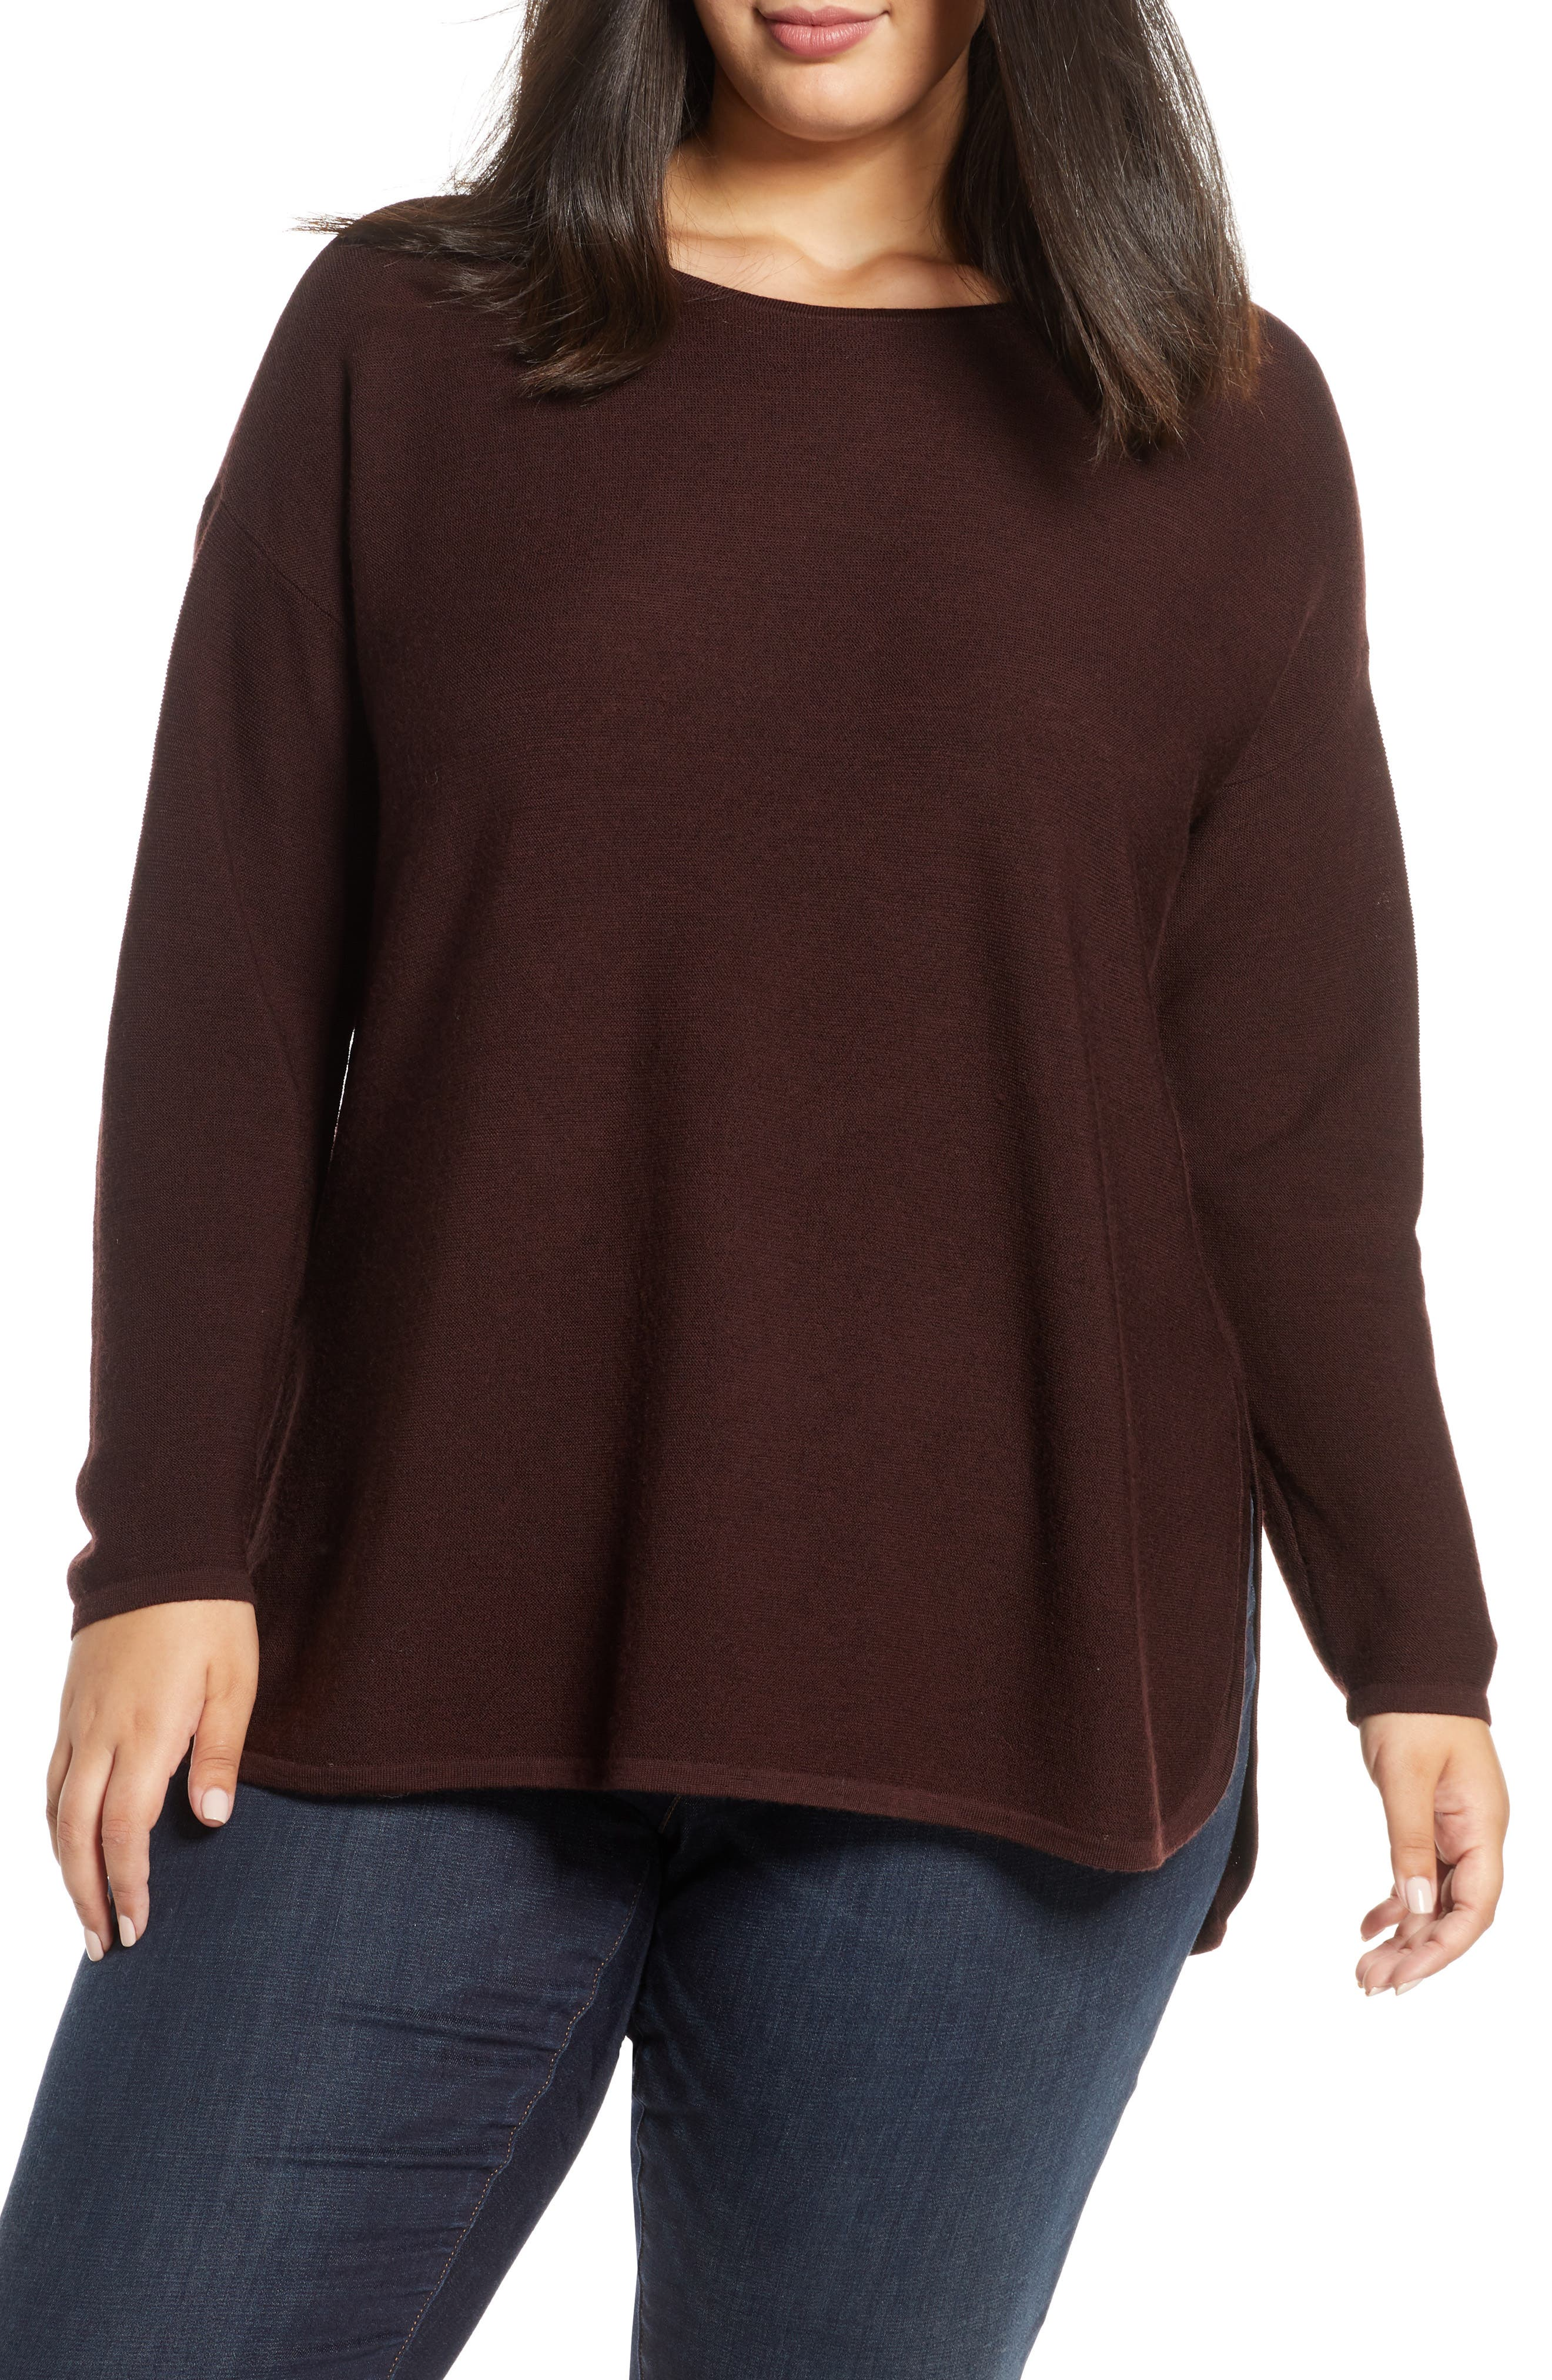 Eileen Fisher Crewneck Merino Wool Tunic Top (Plus Size)